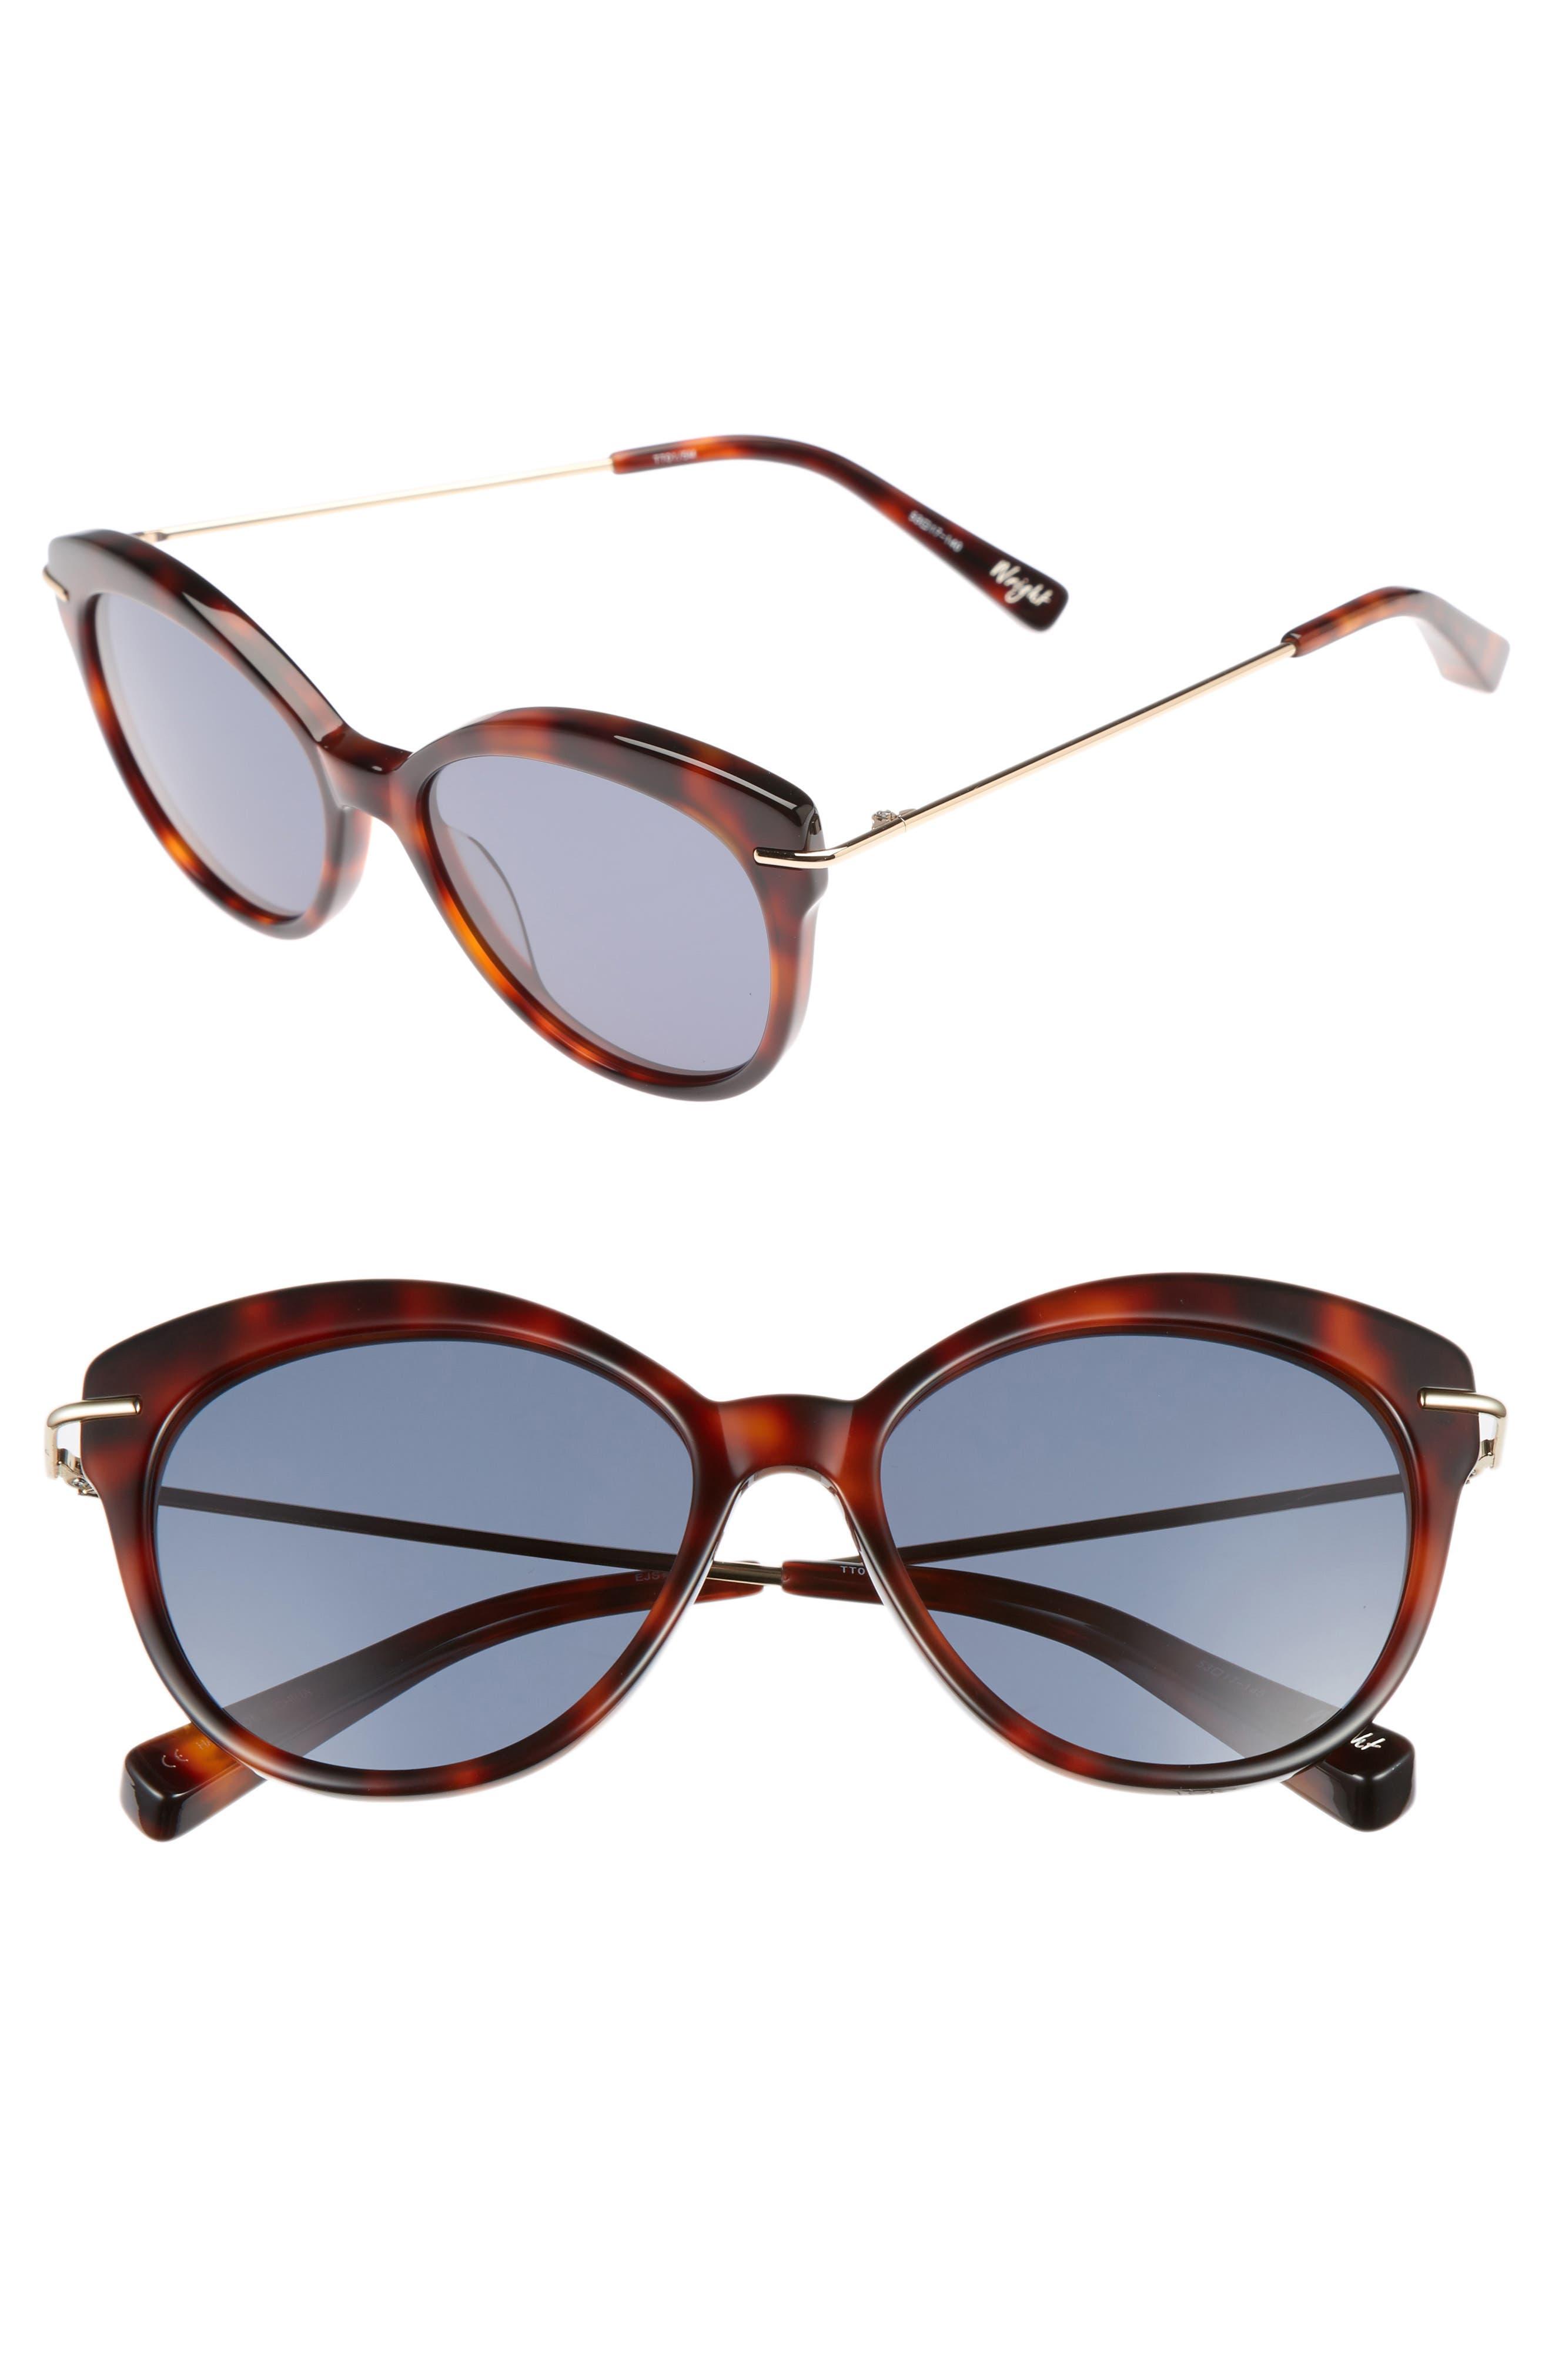 Main Image - Elizabeth and James Wright 53mm Cat Eye Sunglasses